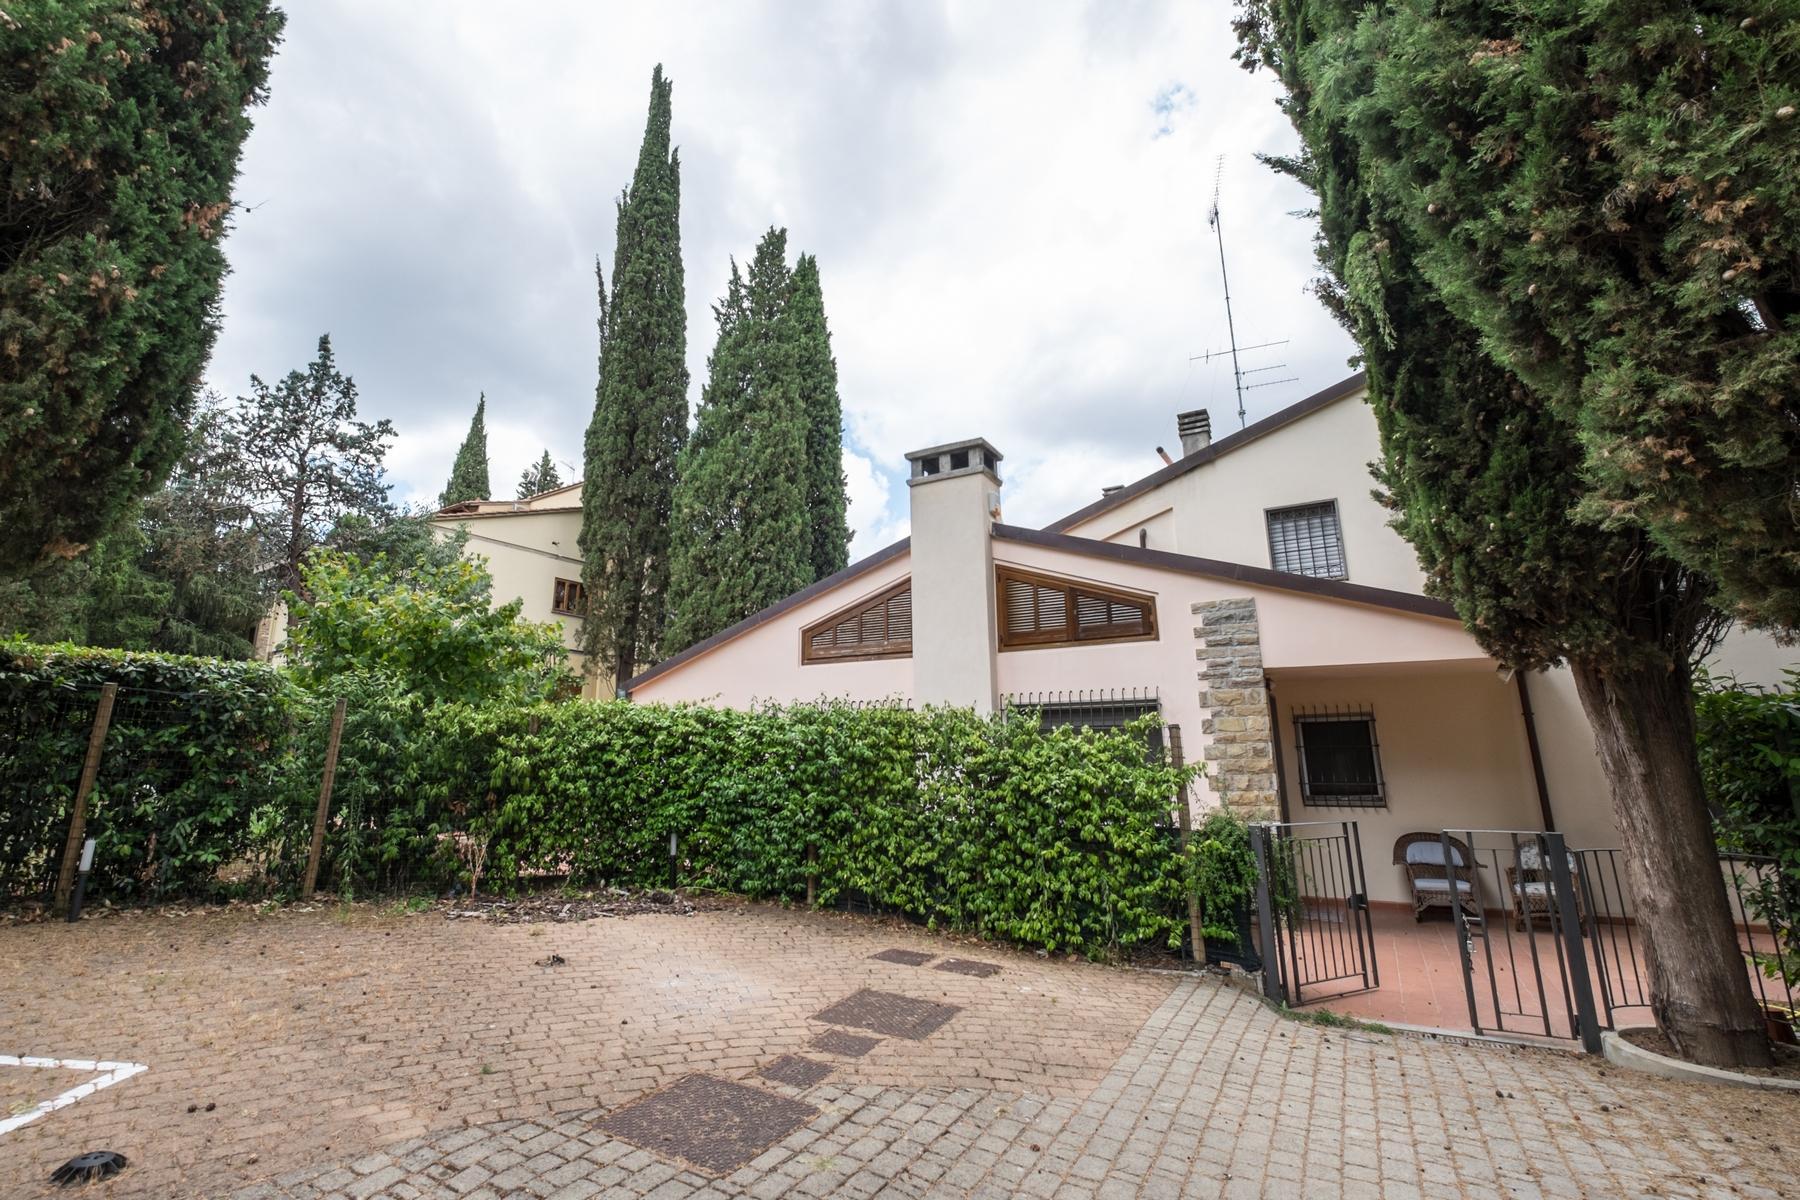 Schöne Wohnung in Poggio Imperiale - 10